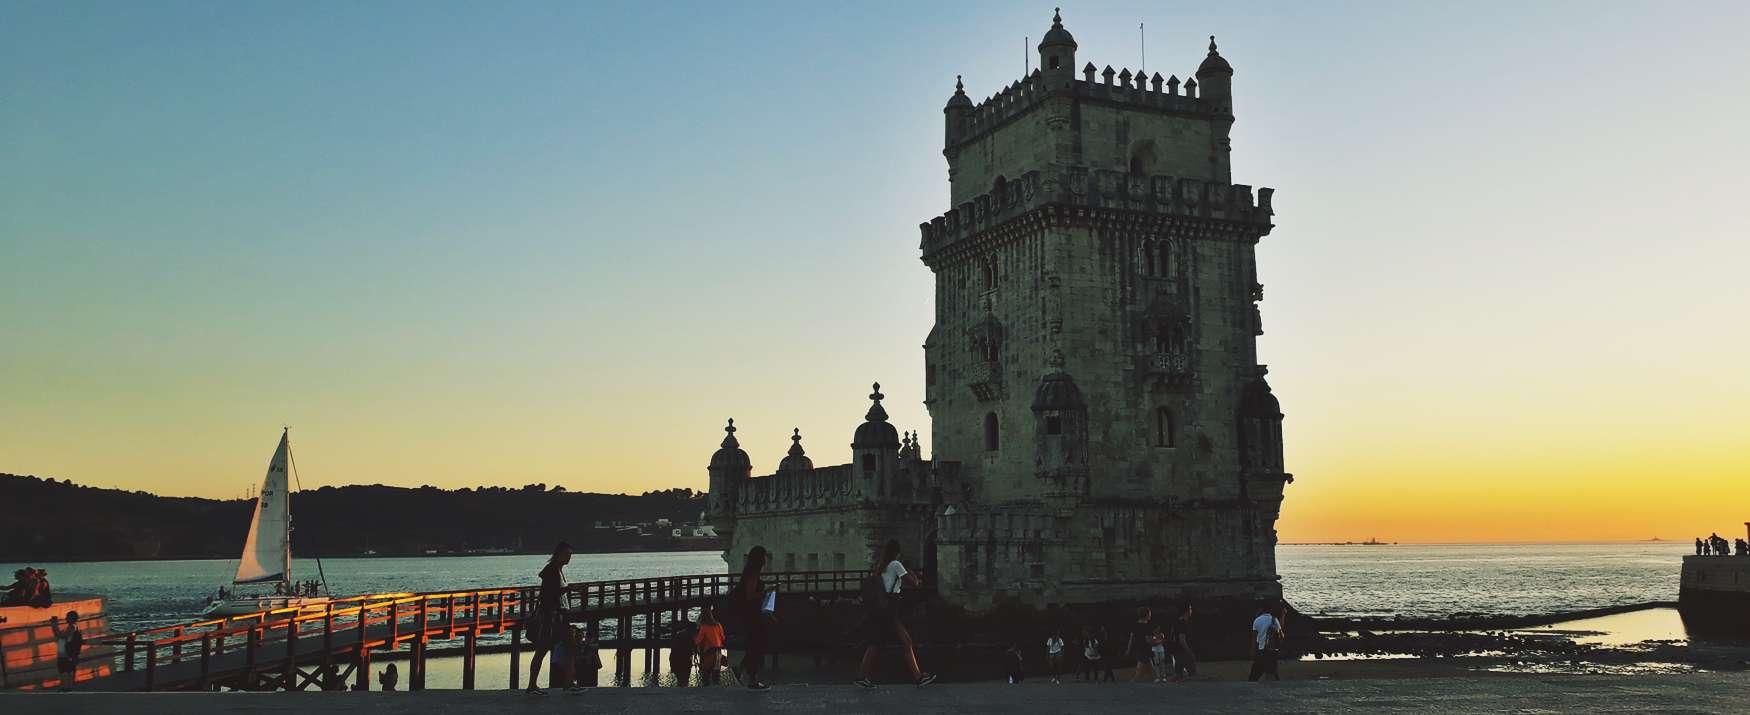 ¿Merece la pena visitar la Torre de Belém?